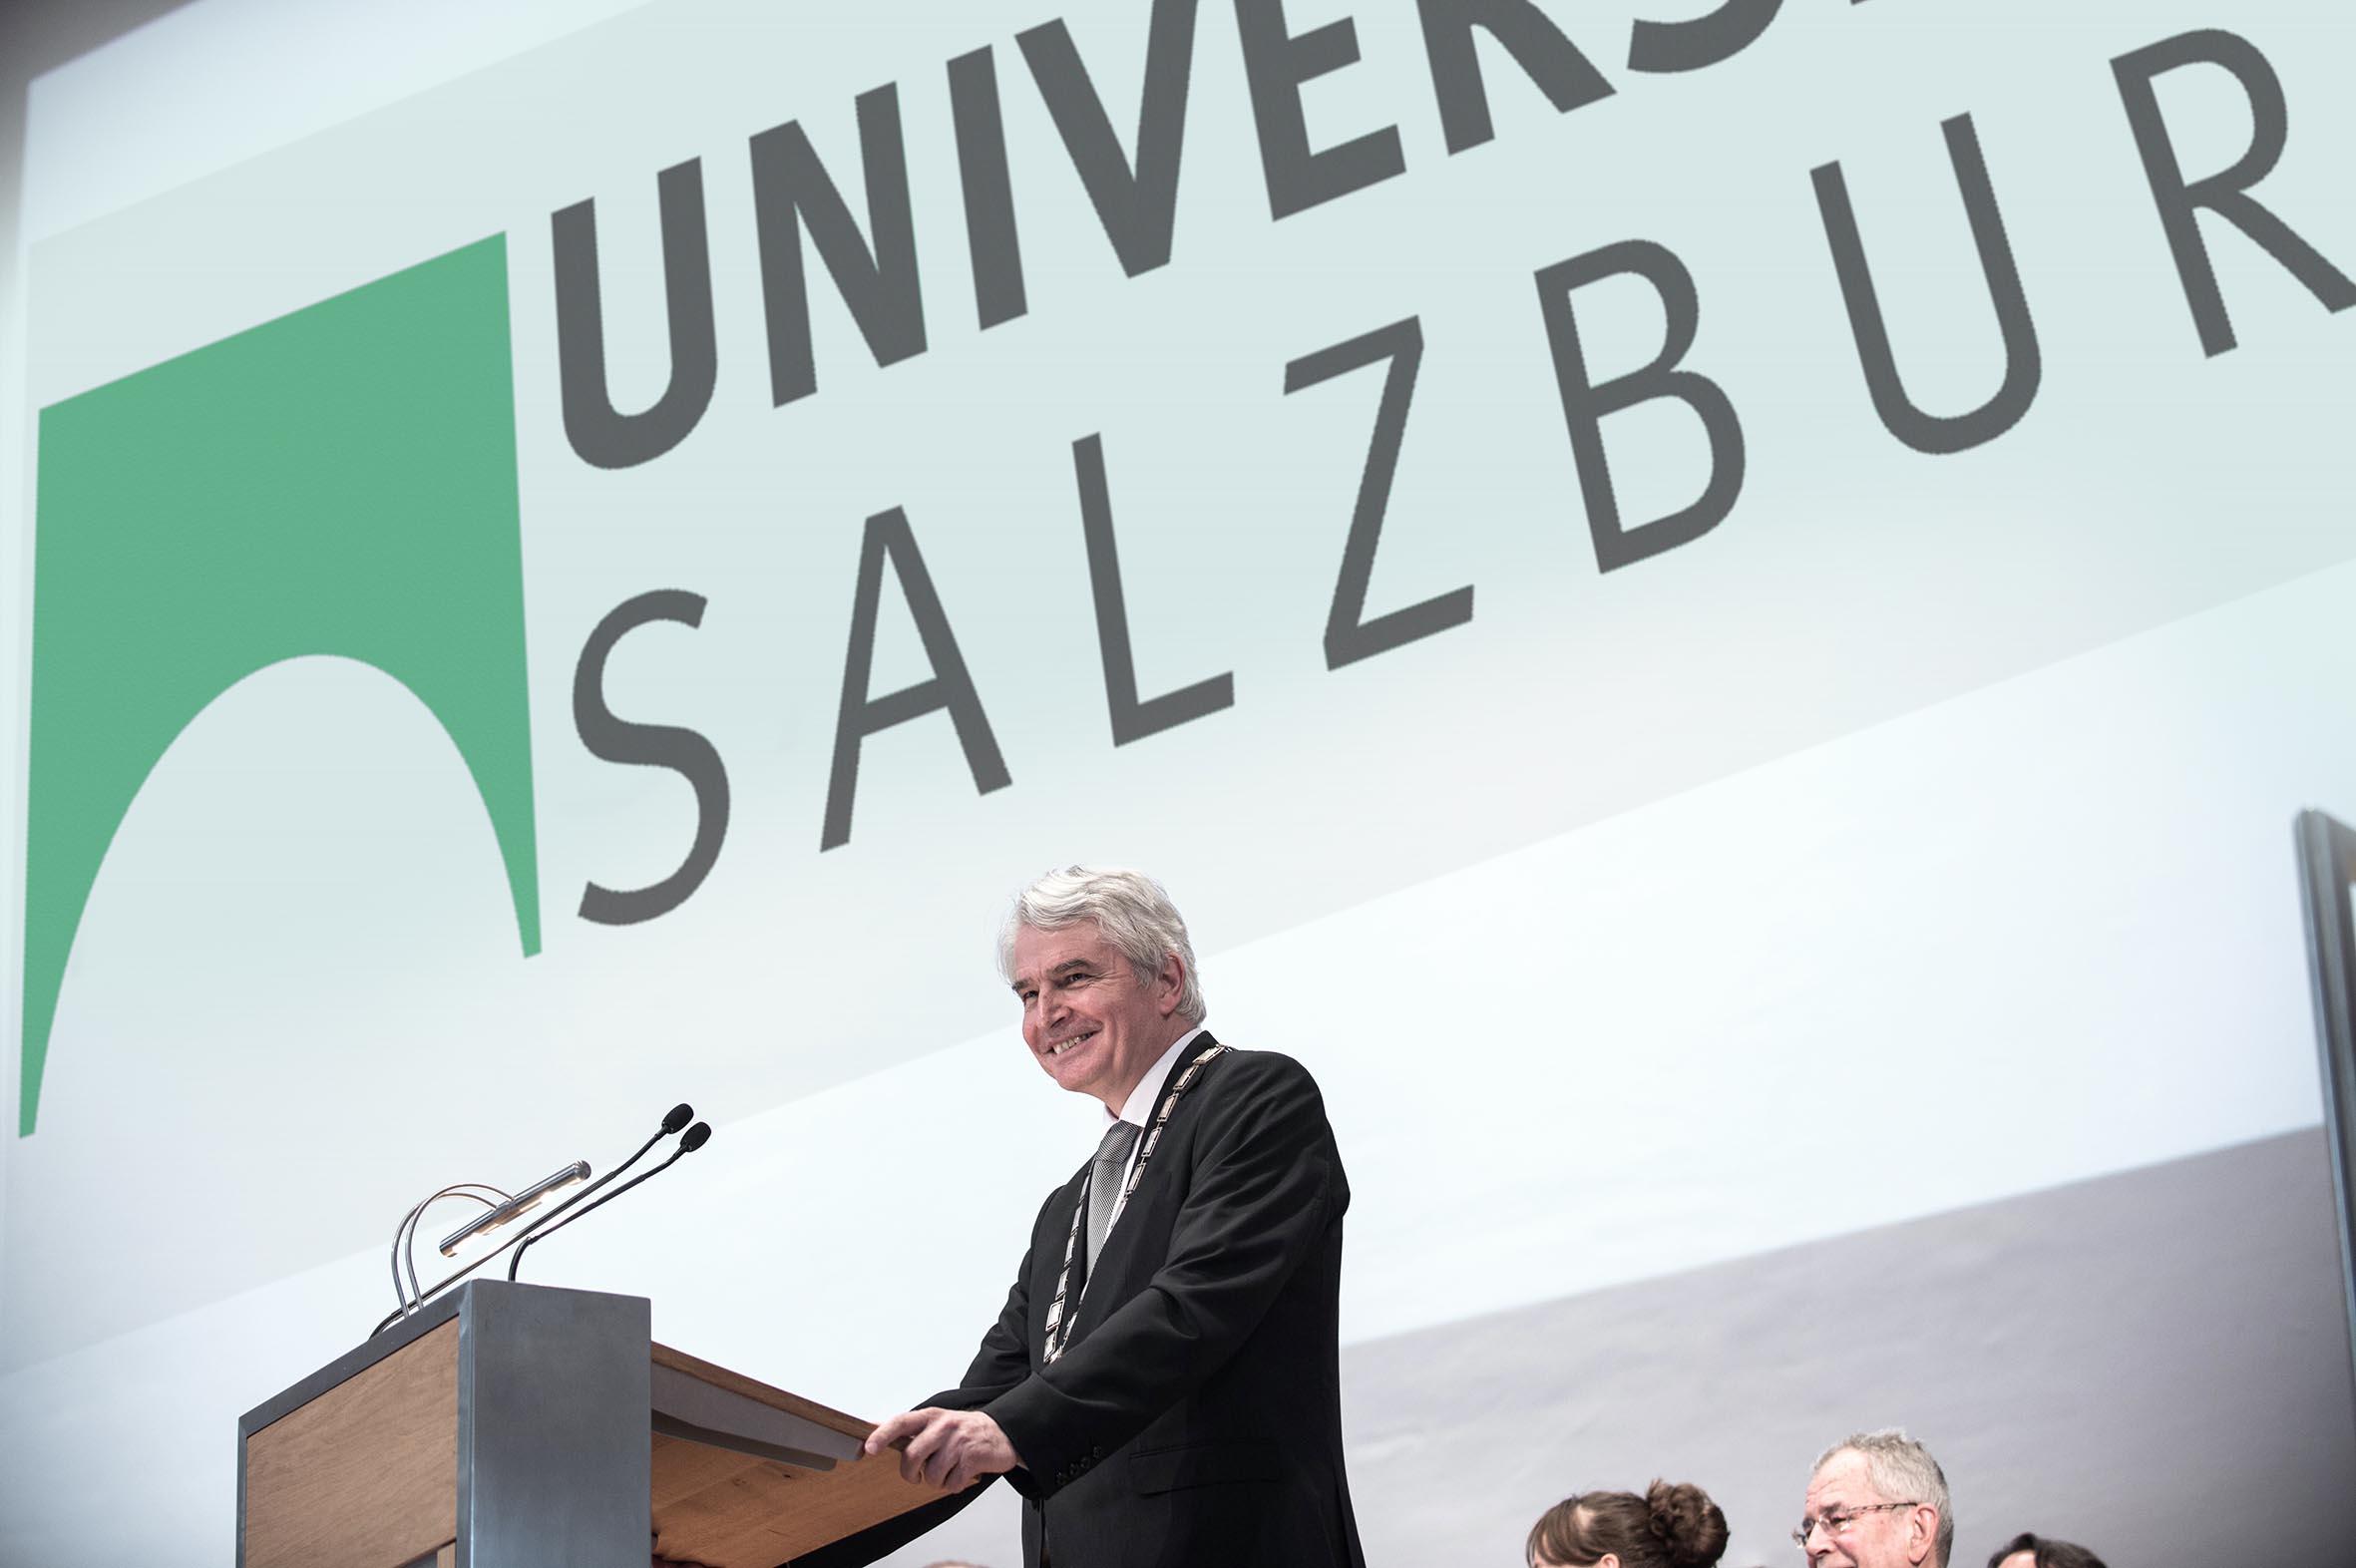 Reportagefotografie, Heinrich Schidinger, Universität Salzburg,Fotoreportage Salzburg, Fotoreportage, Fotograf Salzburg, Foto Hubert Auer, Tag der Universität, Fotograf Salzburg